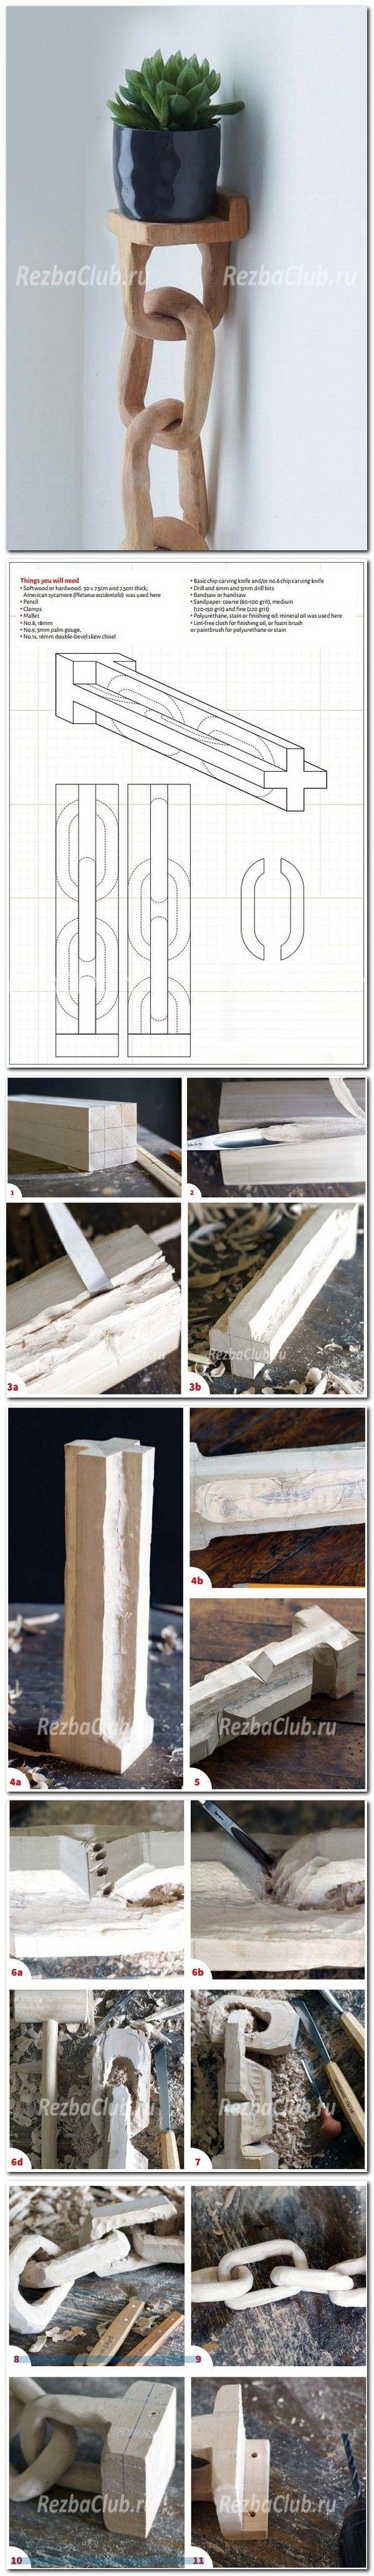 Best 25+ Woodworking templates ideas on Pinterest | Mountain style ...